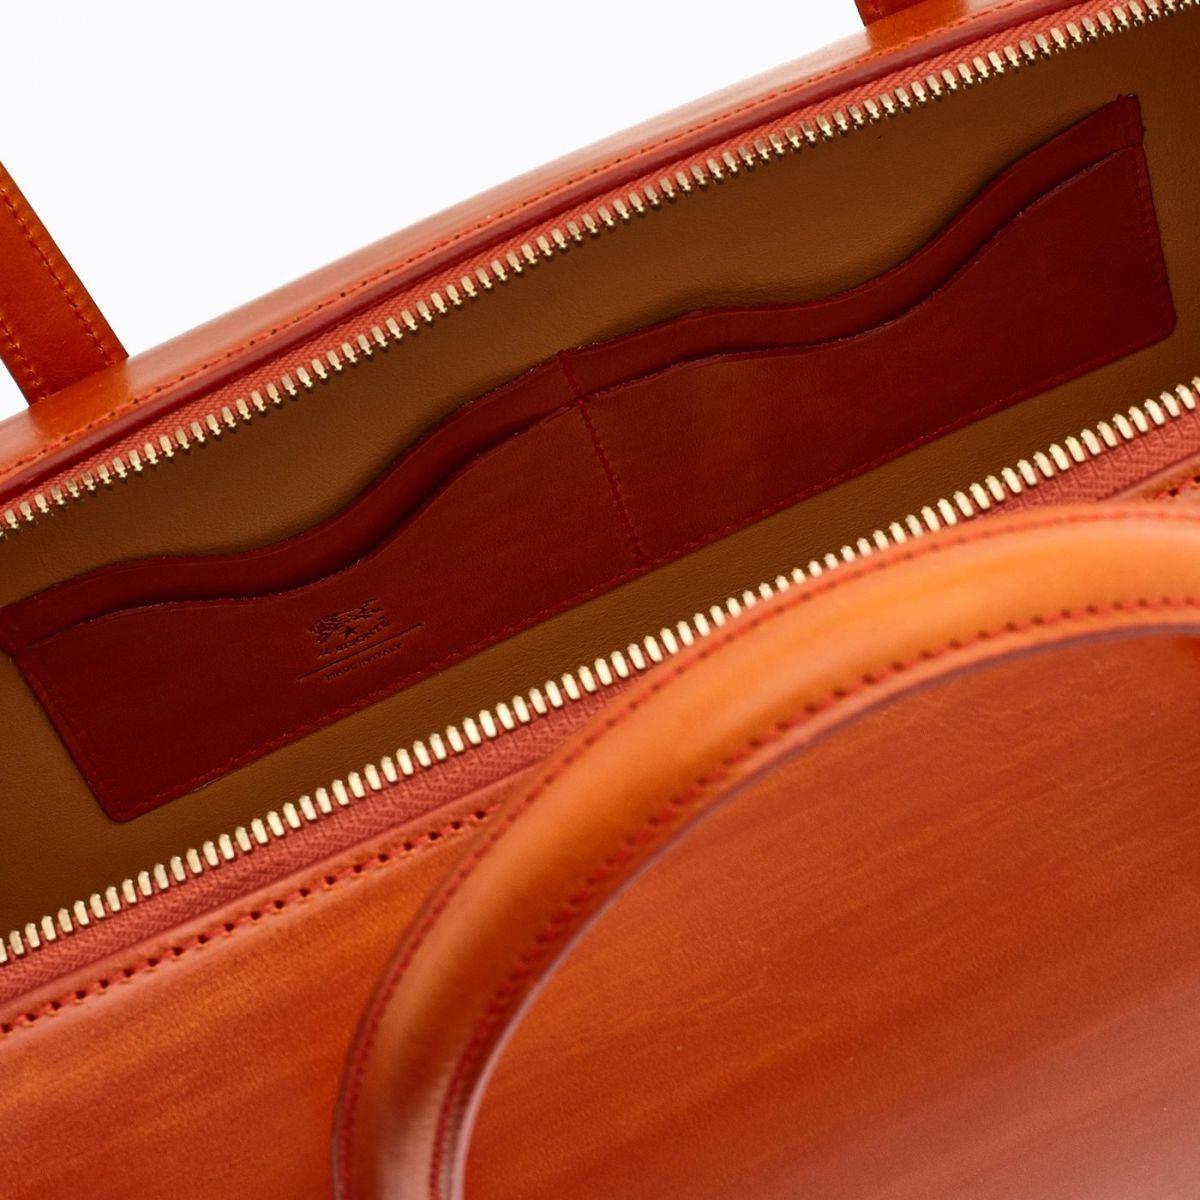 Women's Handbag  in Leather BTH103 color Gazpacho | Details